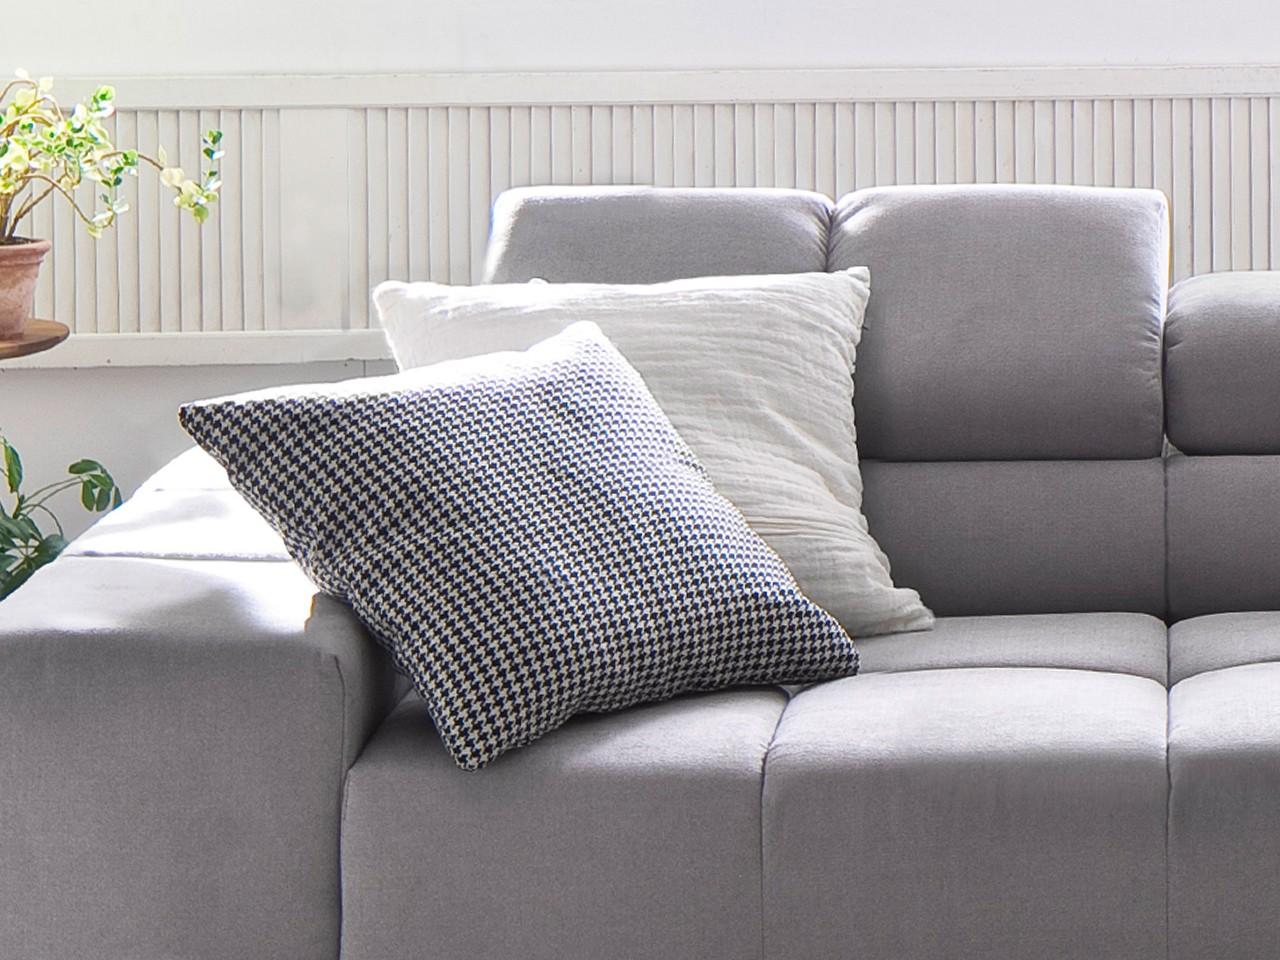 Wilo 2-Sitzer Sofa